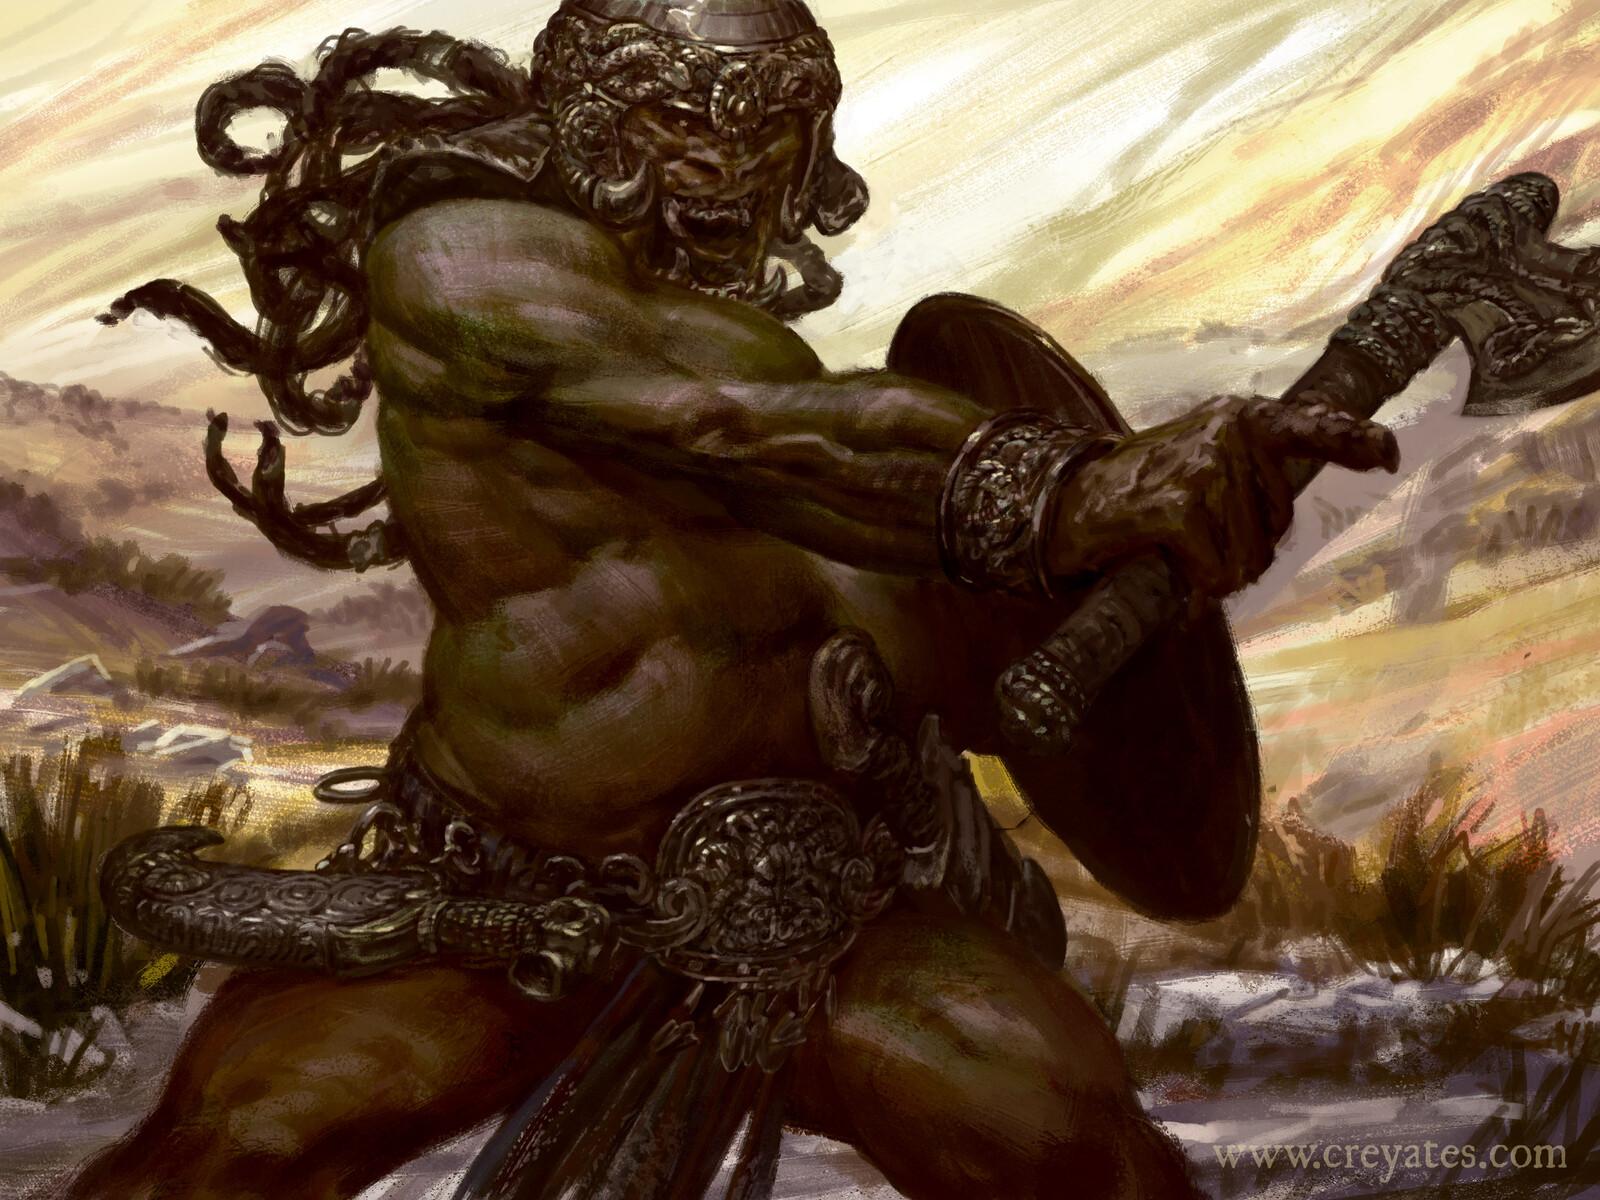 Orc Chieftan